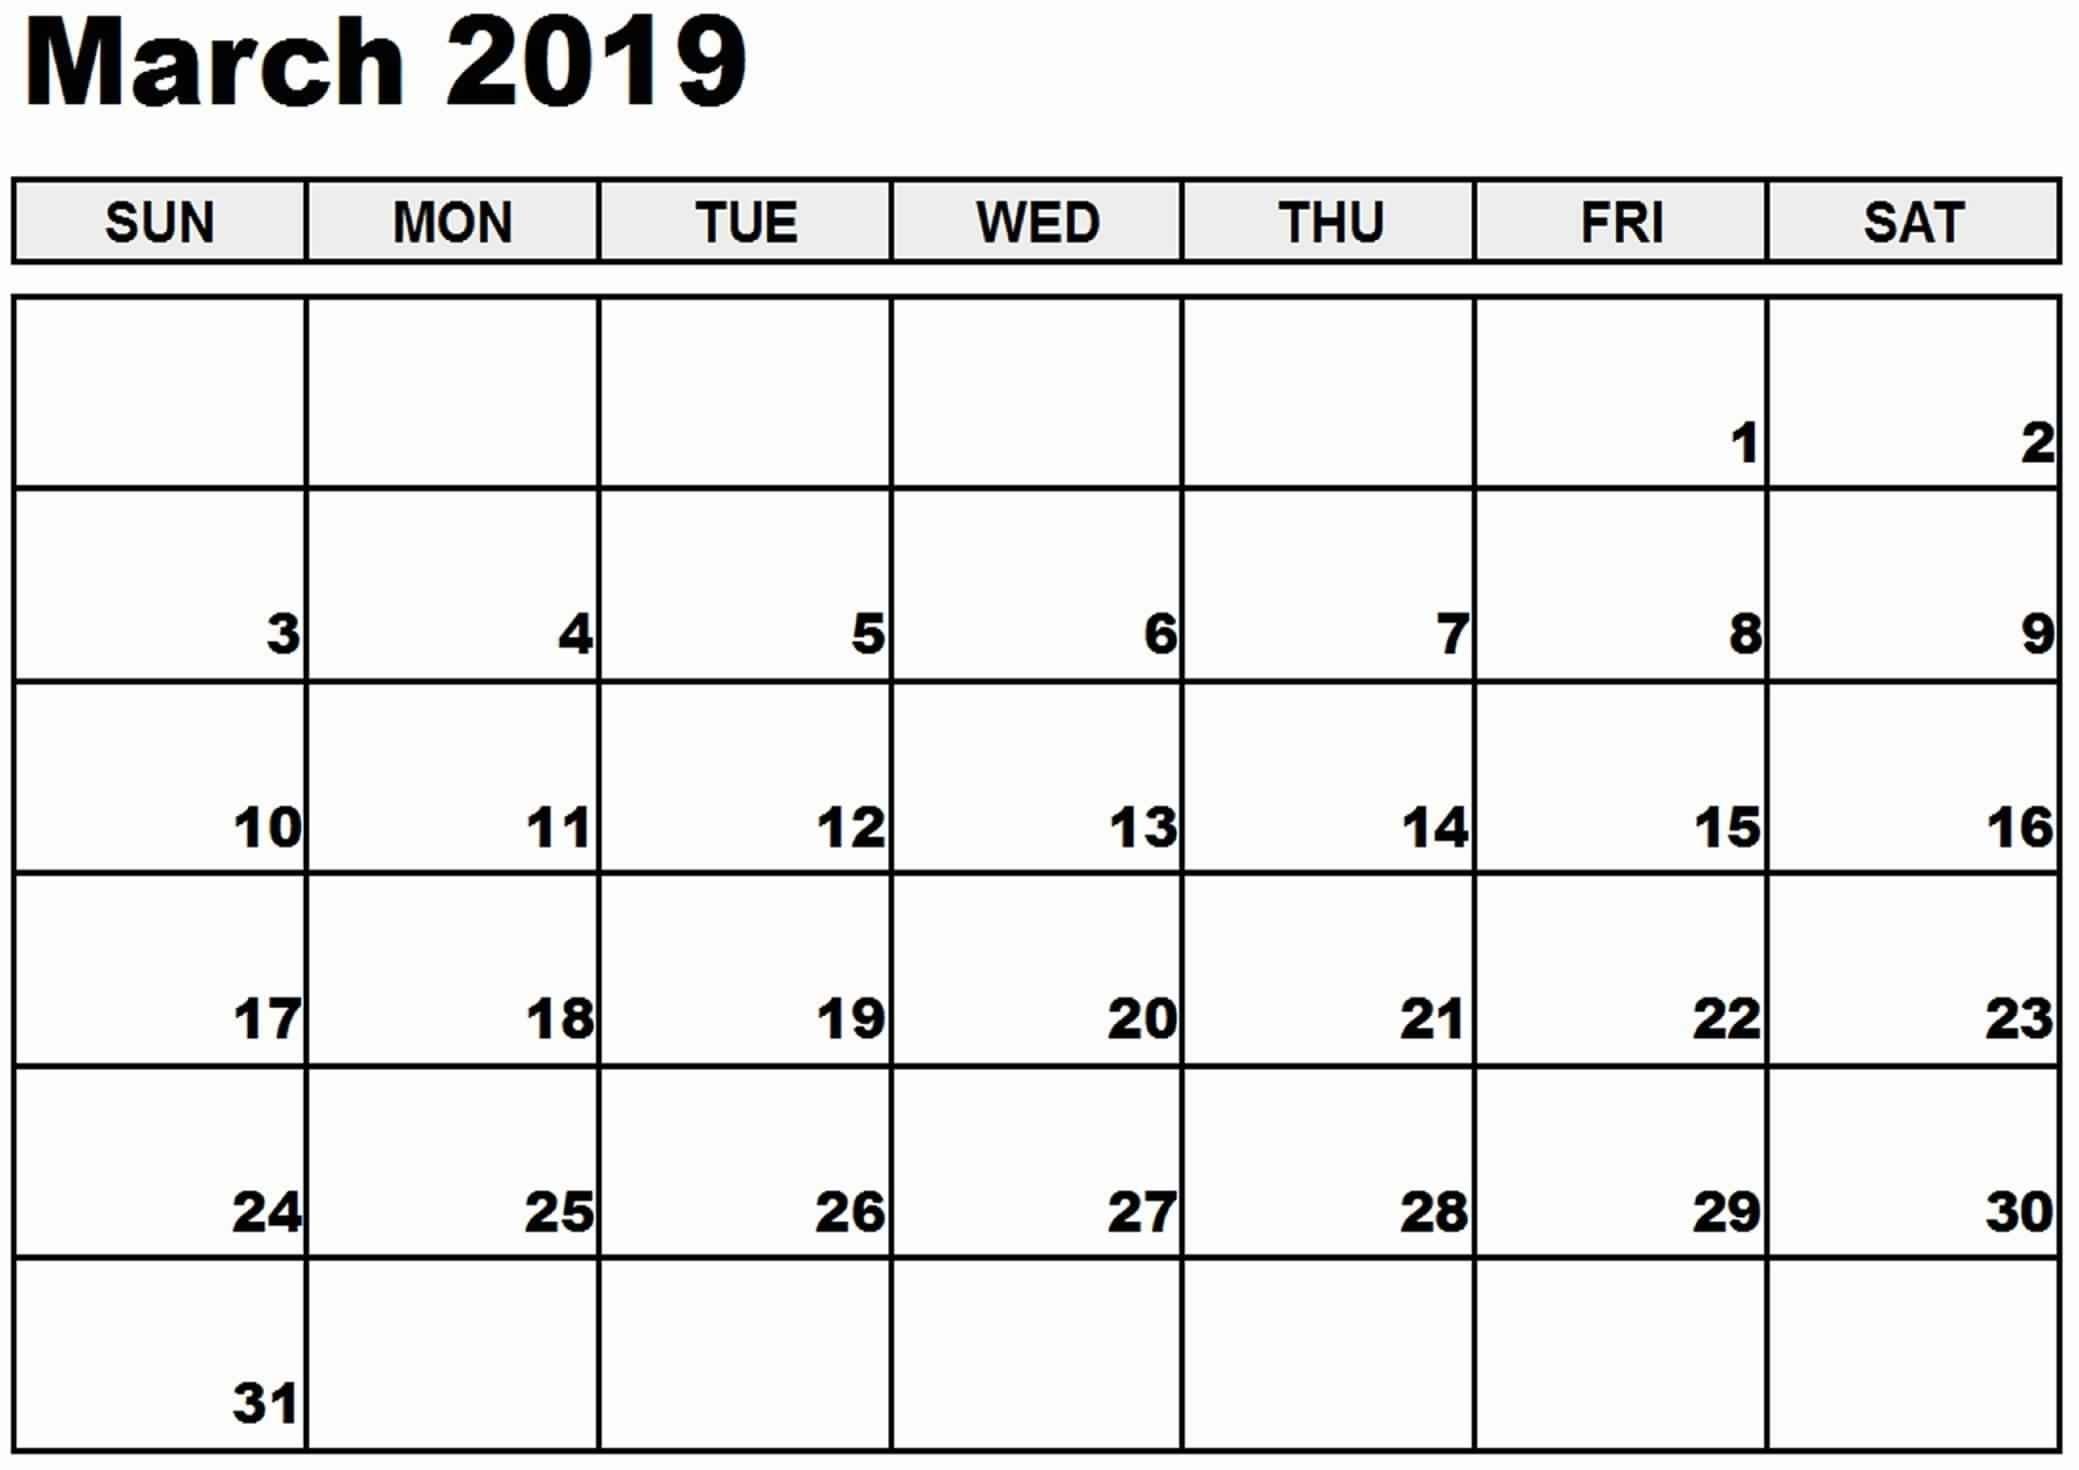 March 2019 Printable Calendar Templates - Free Pdf Word